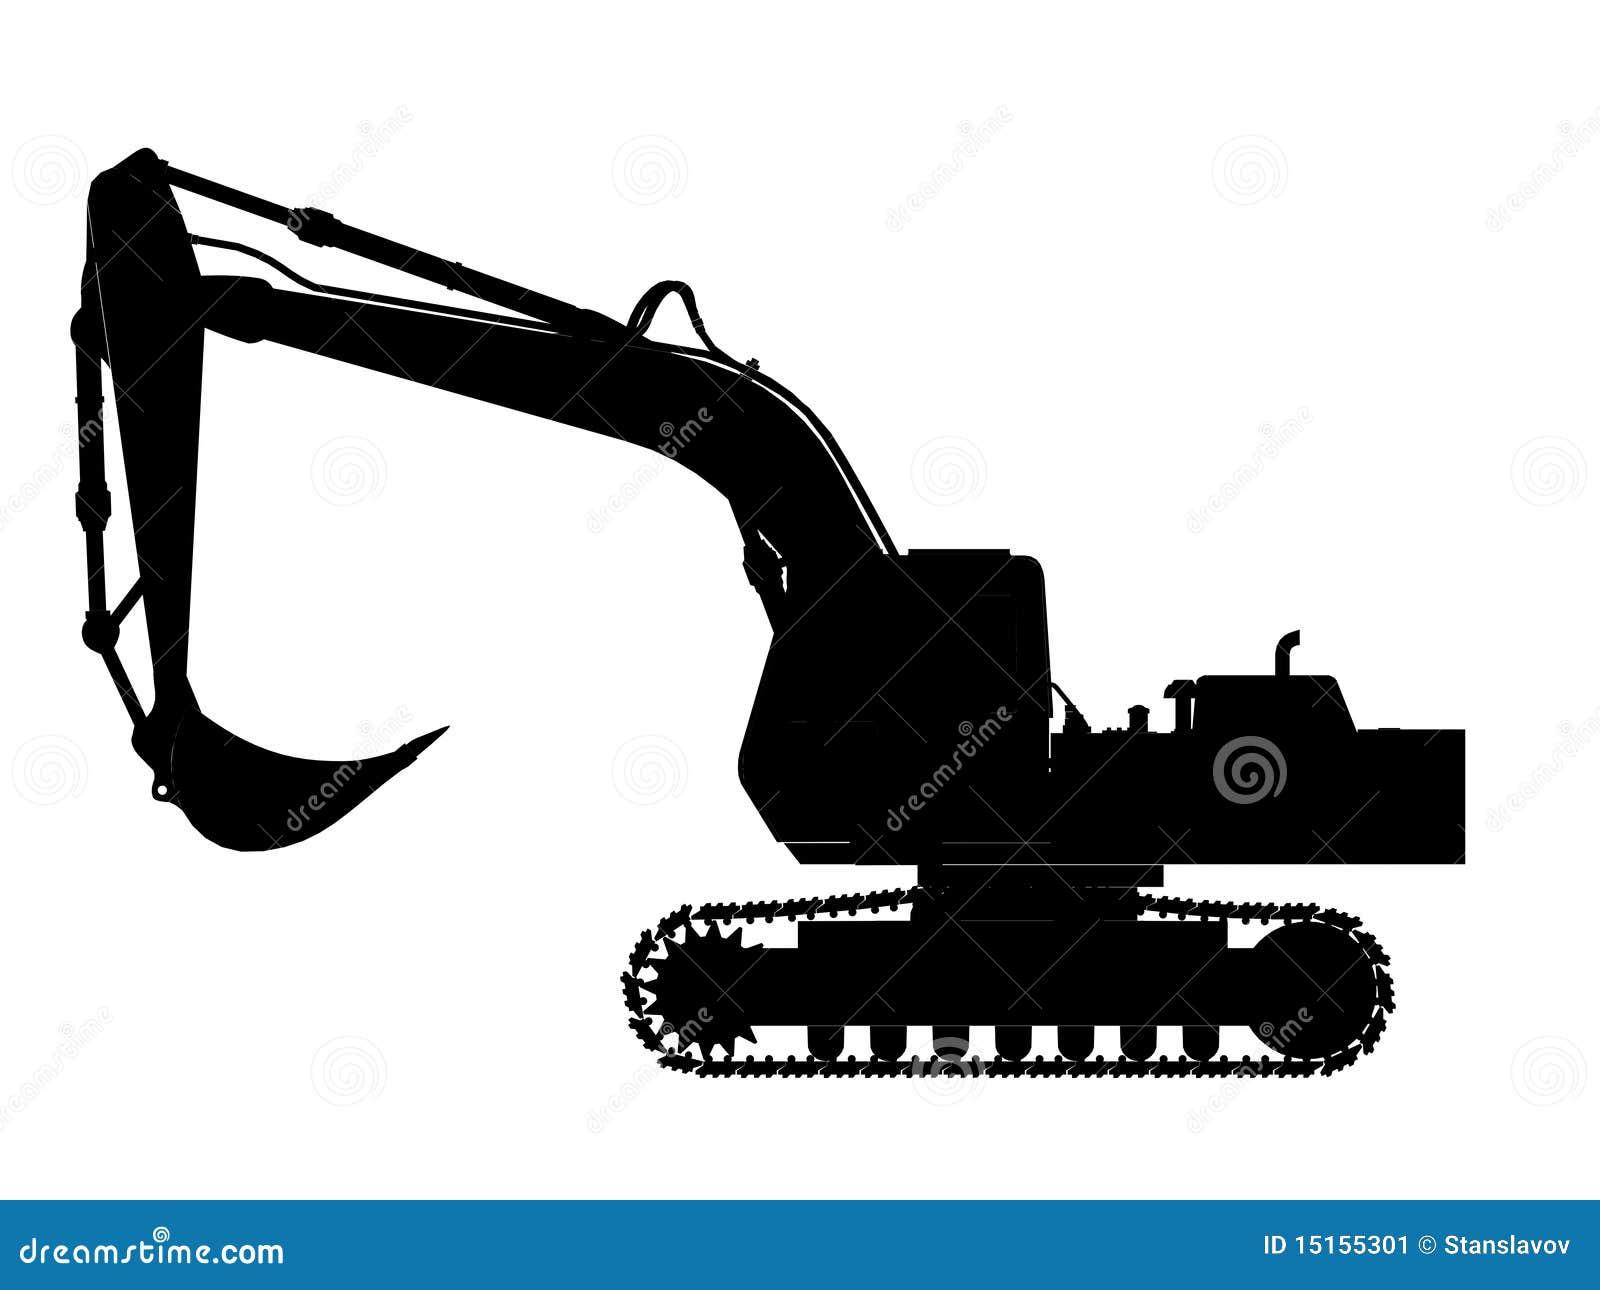 Excavator Silhouette Stock Image - Image: 15155301